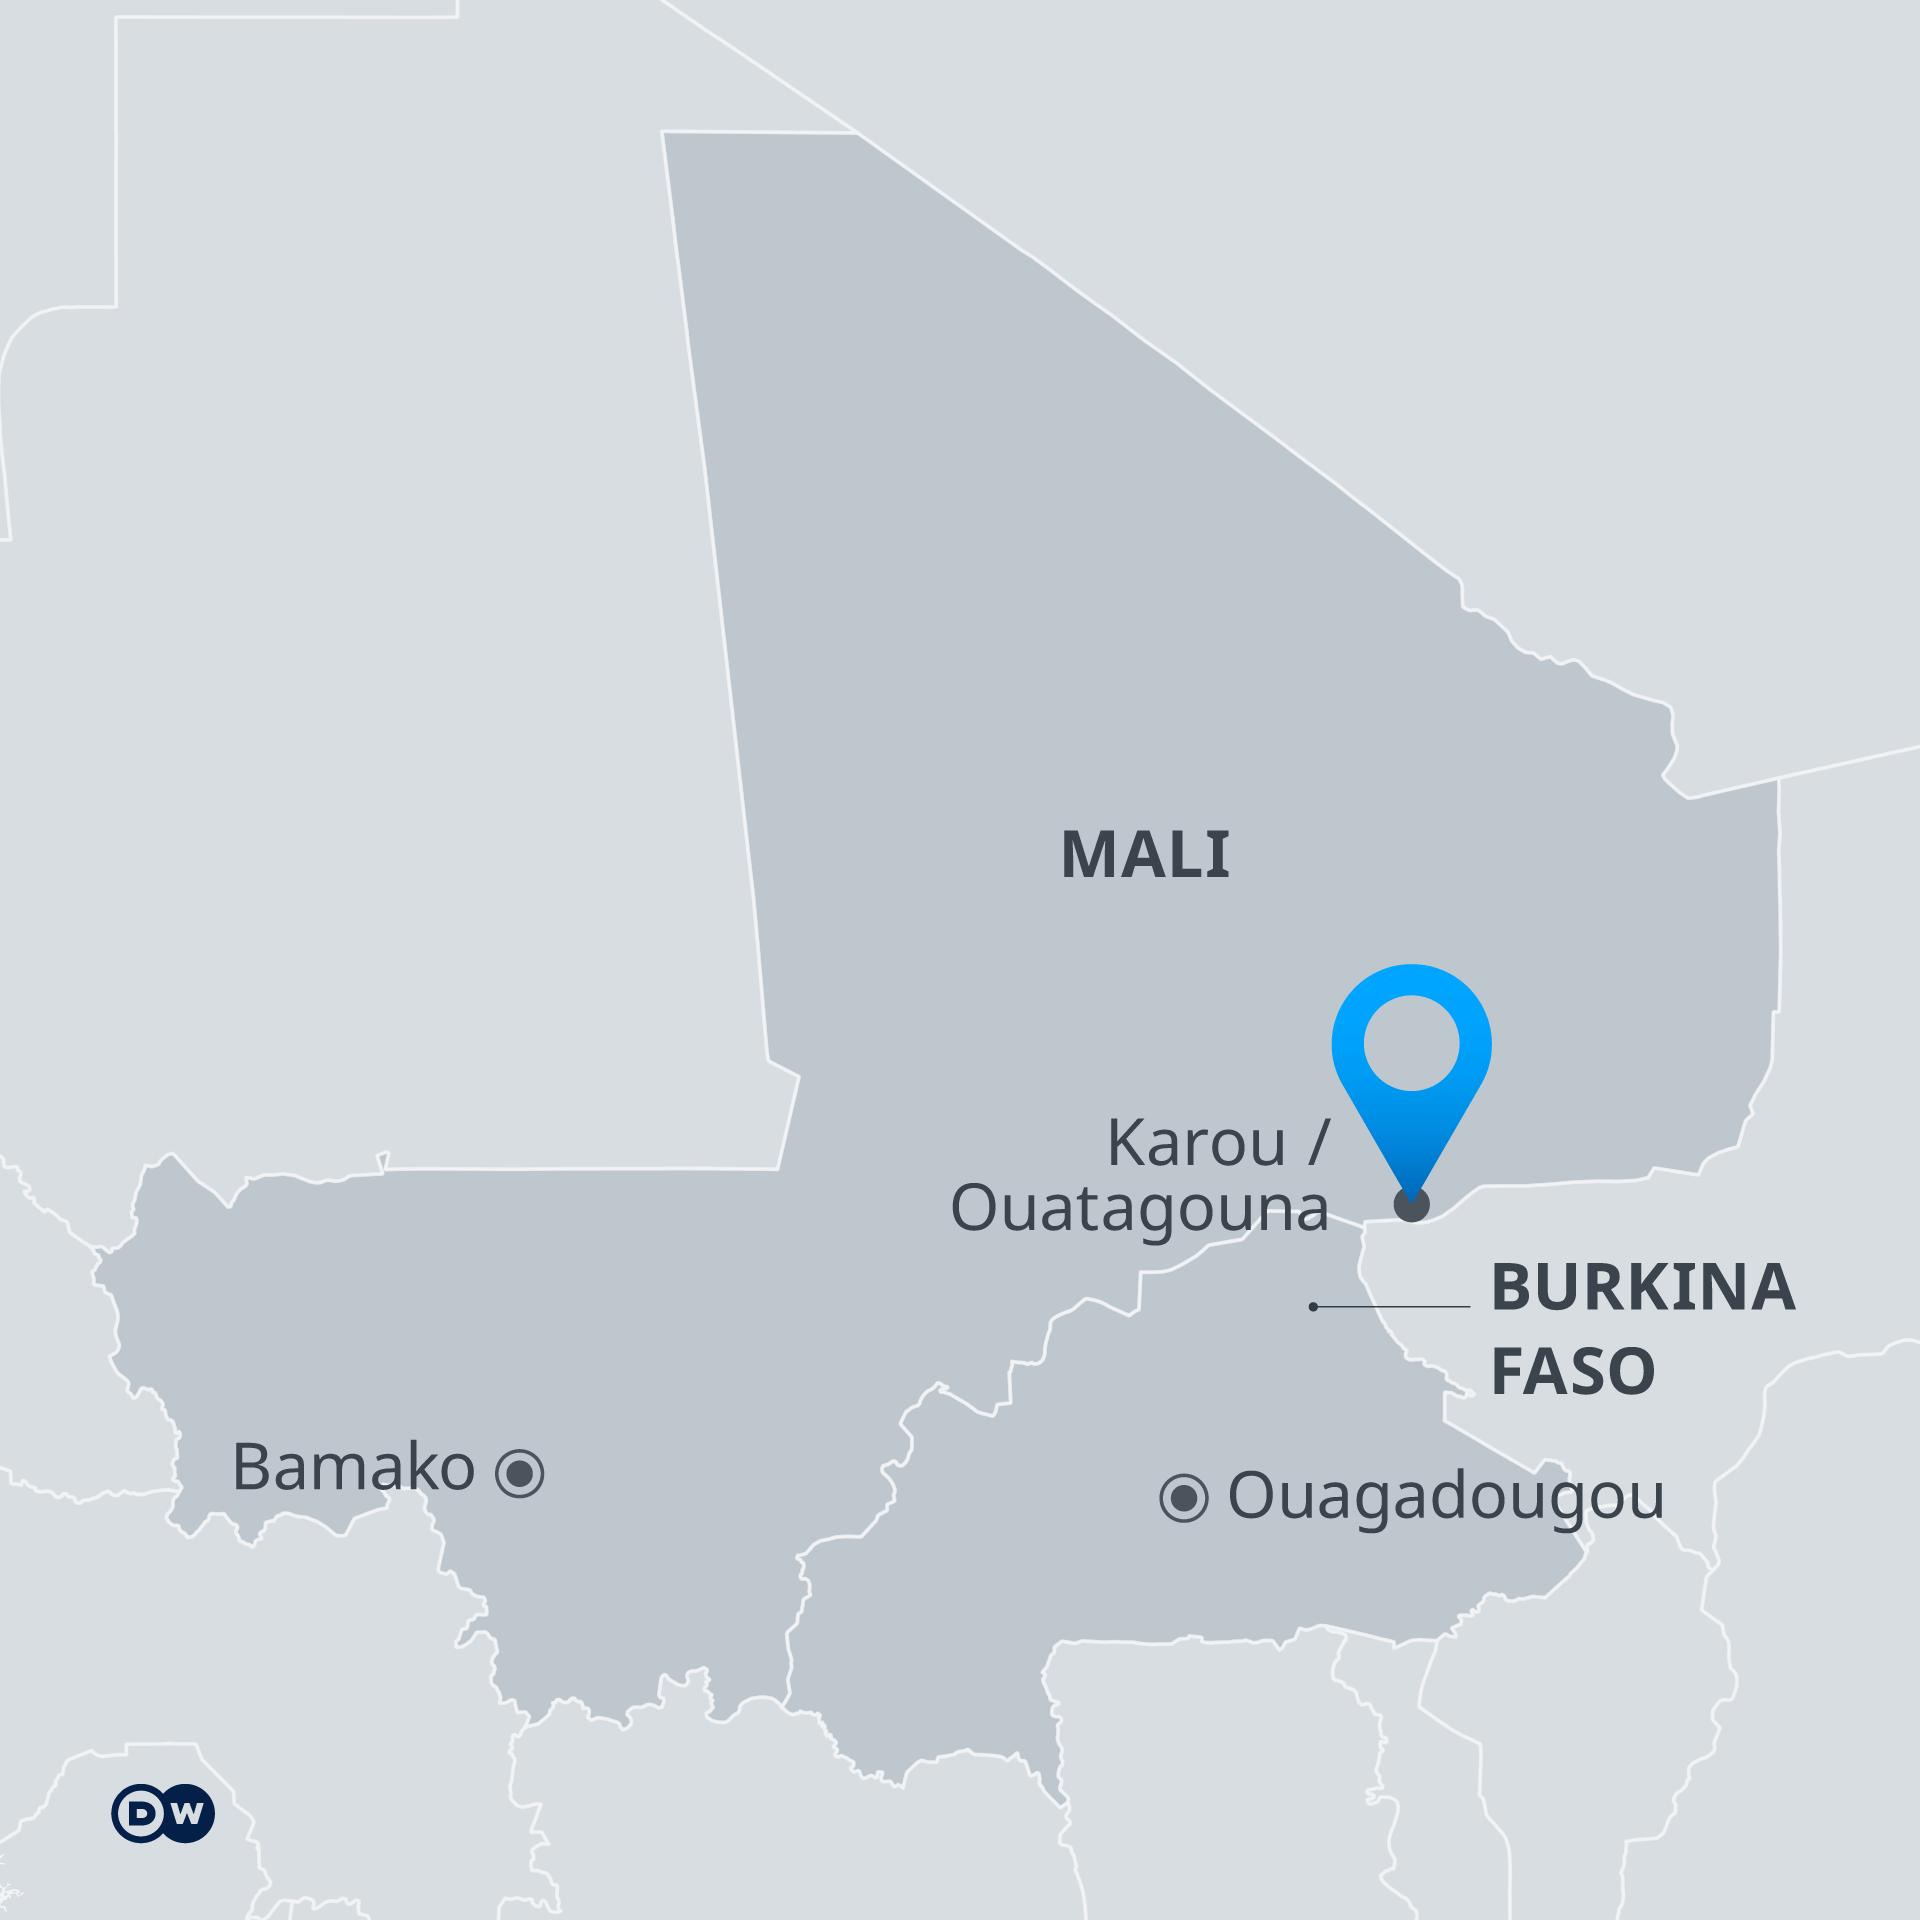 Infografik Karte Mali und Burkina Faso mit Karou und Ouatagouna